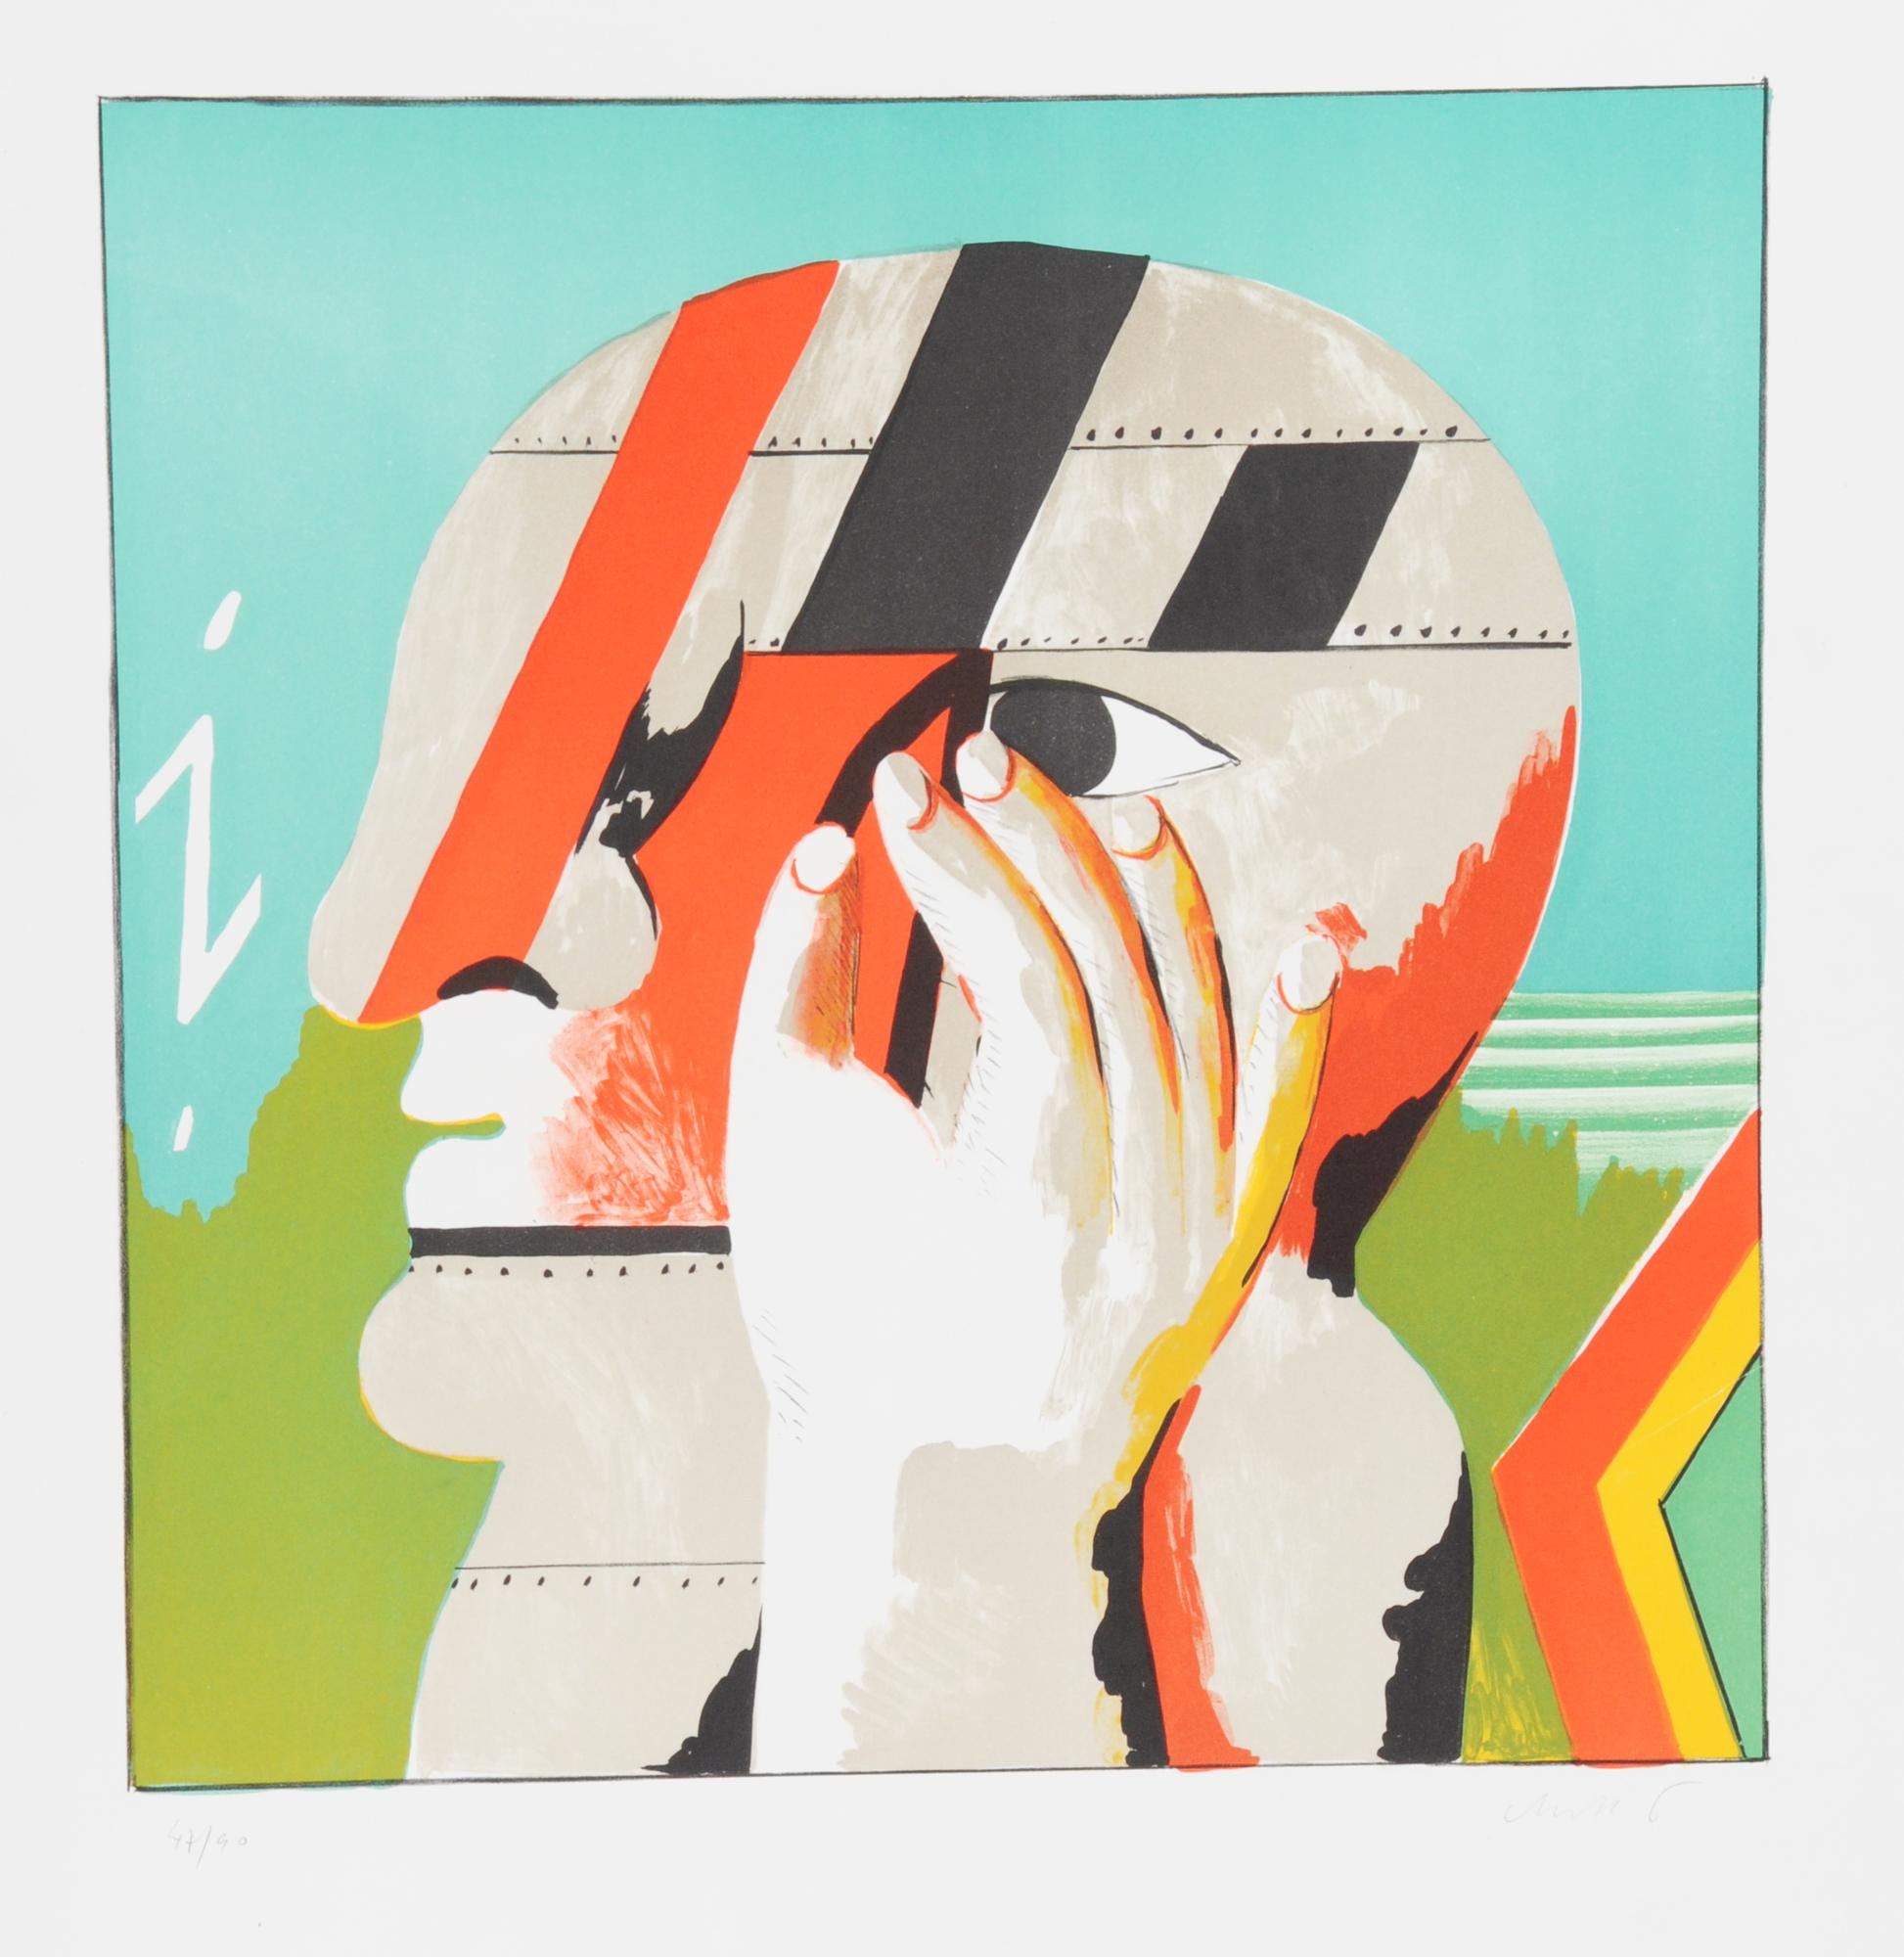 Antes Horst, 2 sheets: Maskierte Figur mit Treppe, 1965; i-Kopf